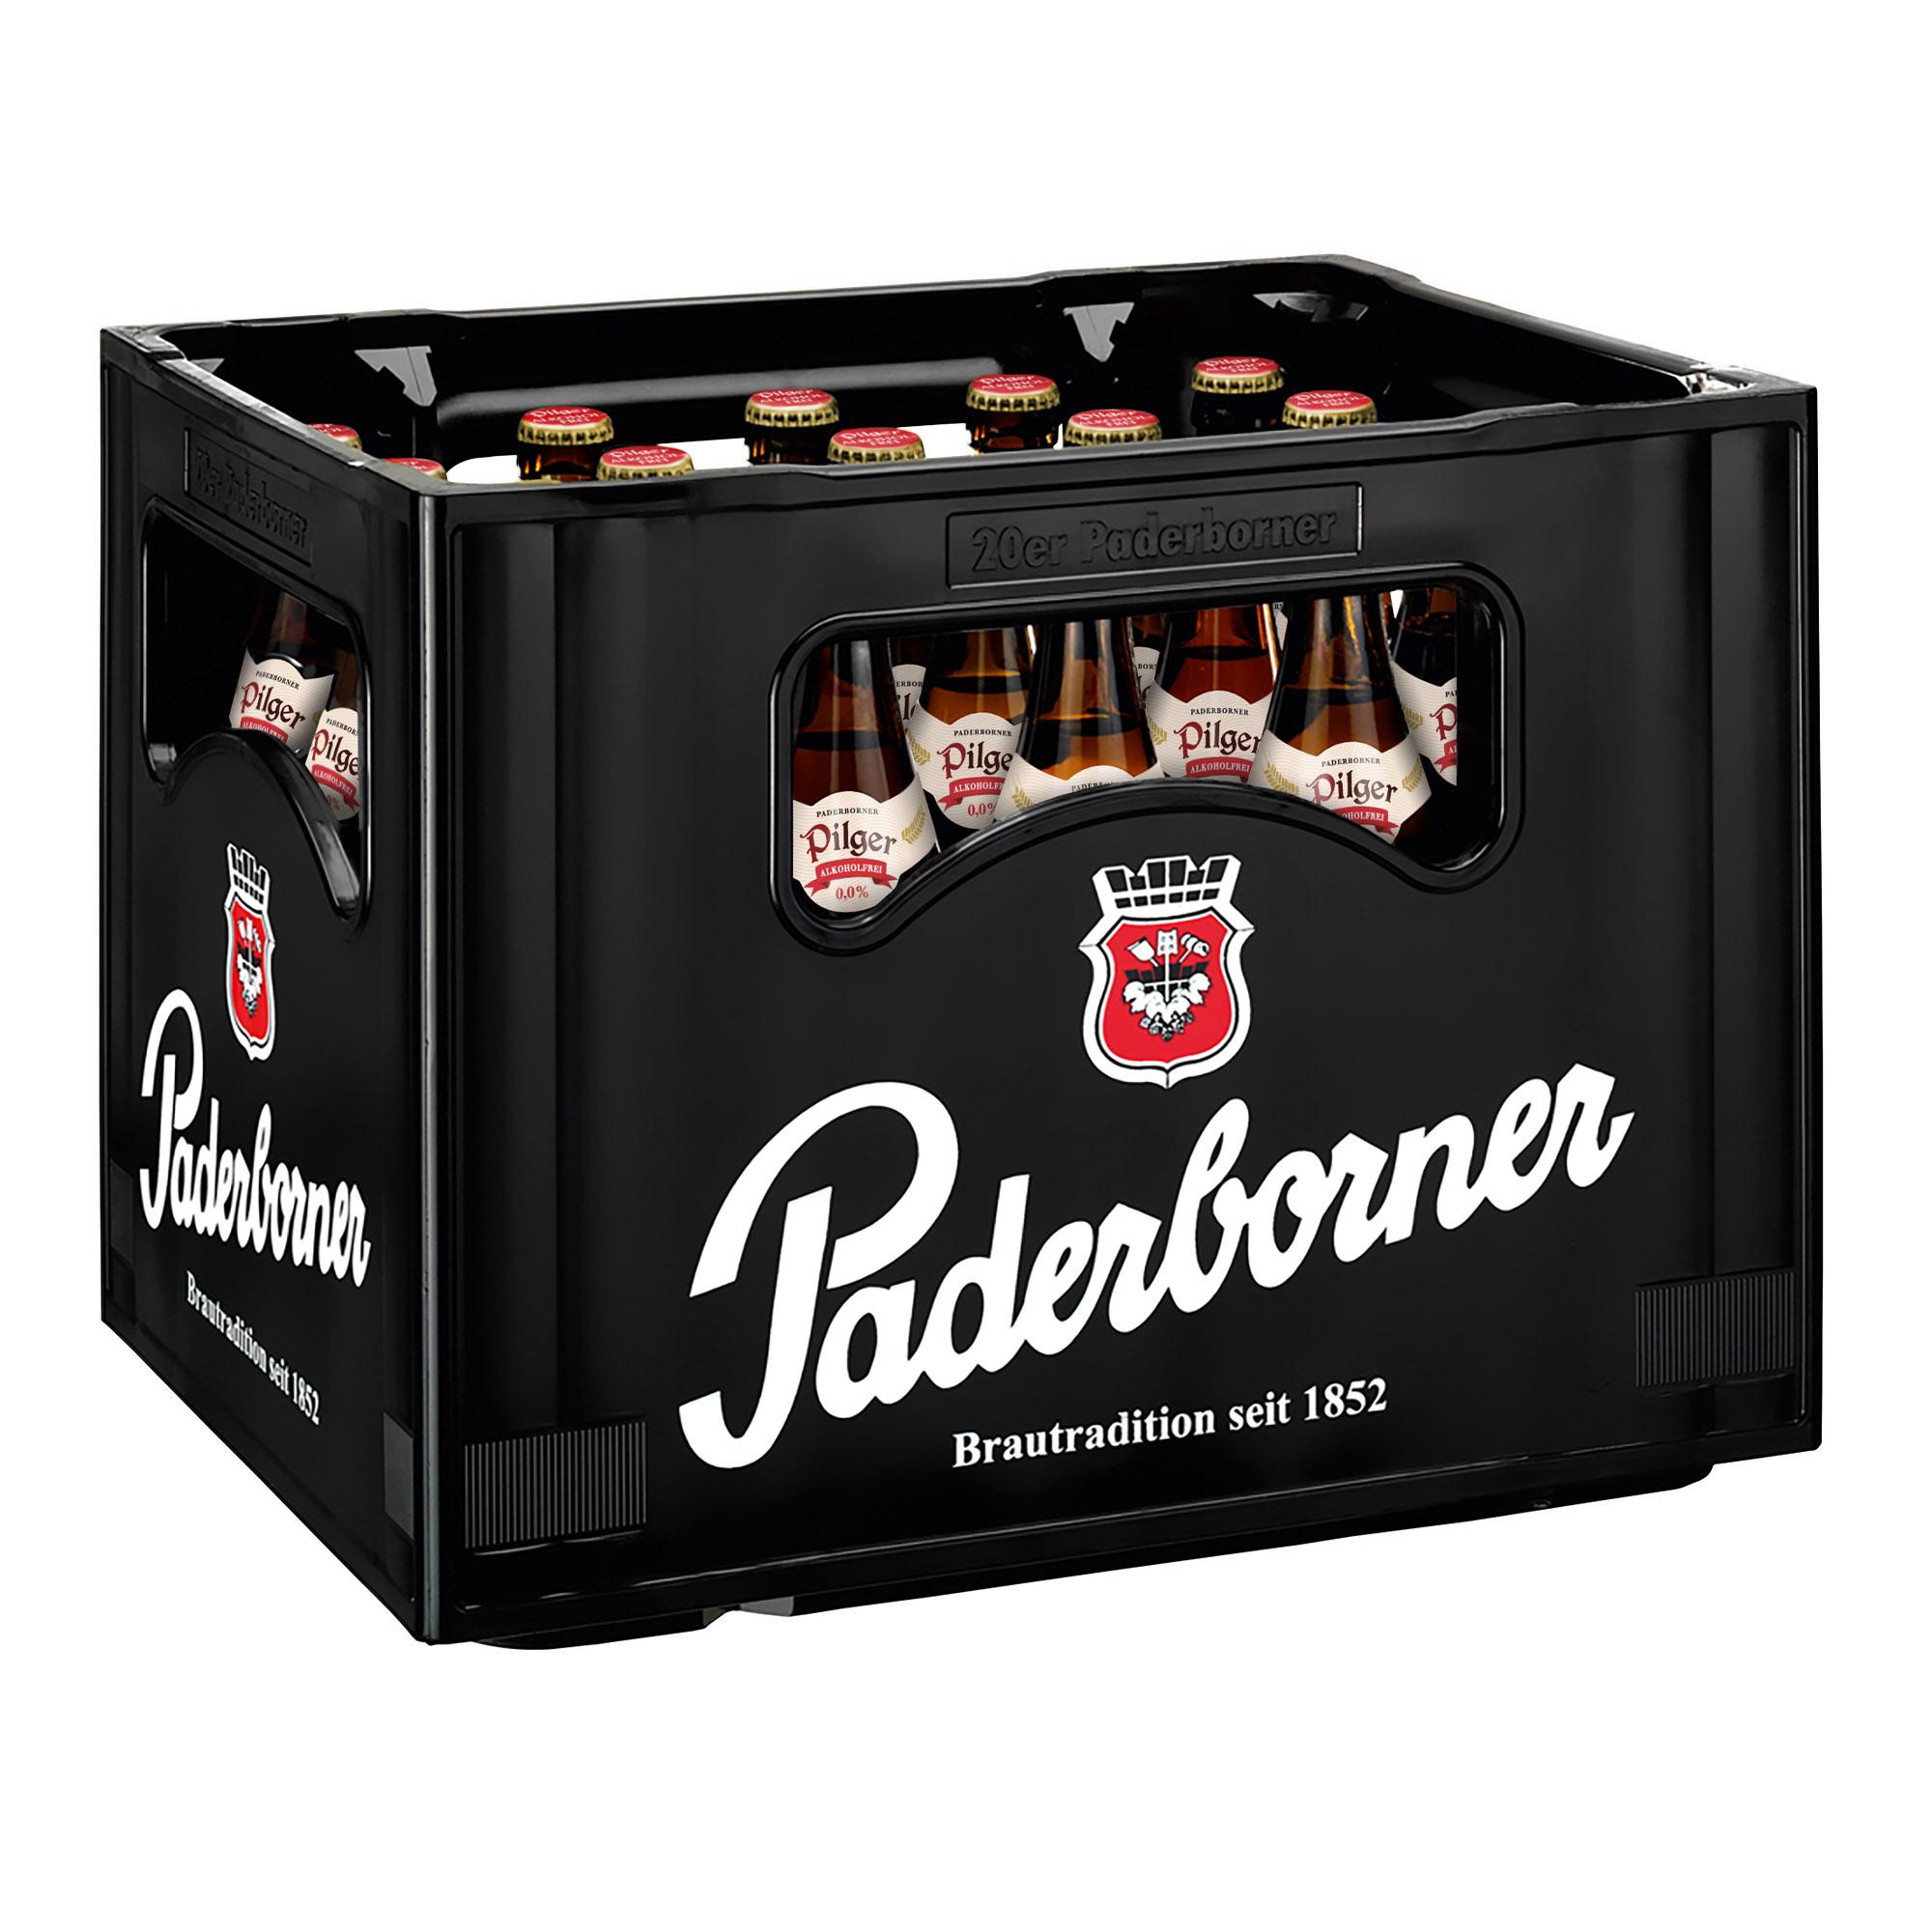 Produktabbildung Paderborner Pilger Alkoholfrei Kasten 20 x 0,5 l